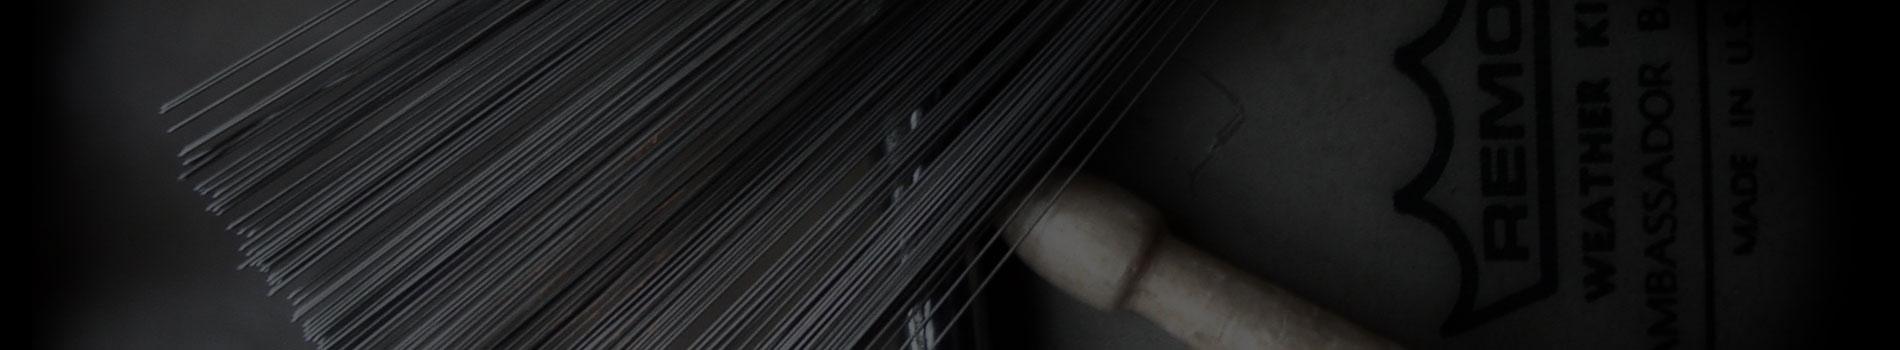 Image of Brush & Stick on Drum